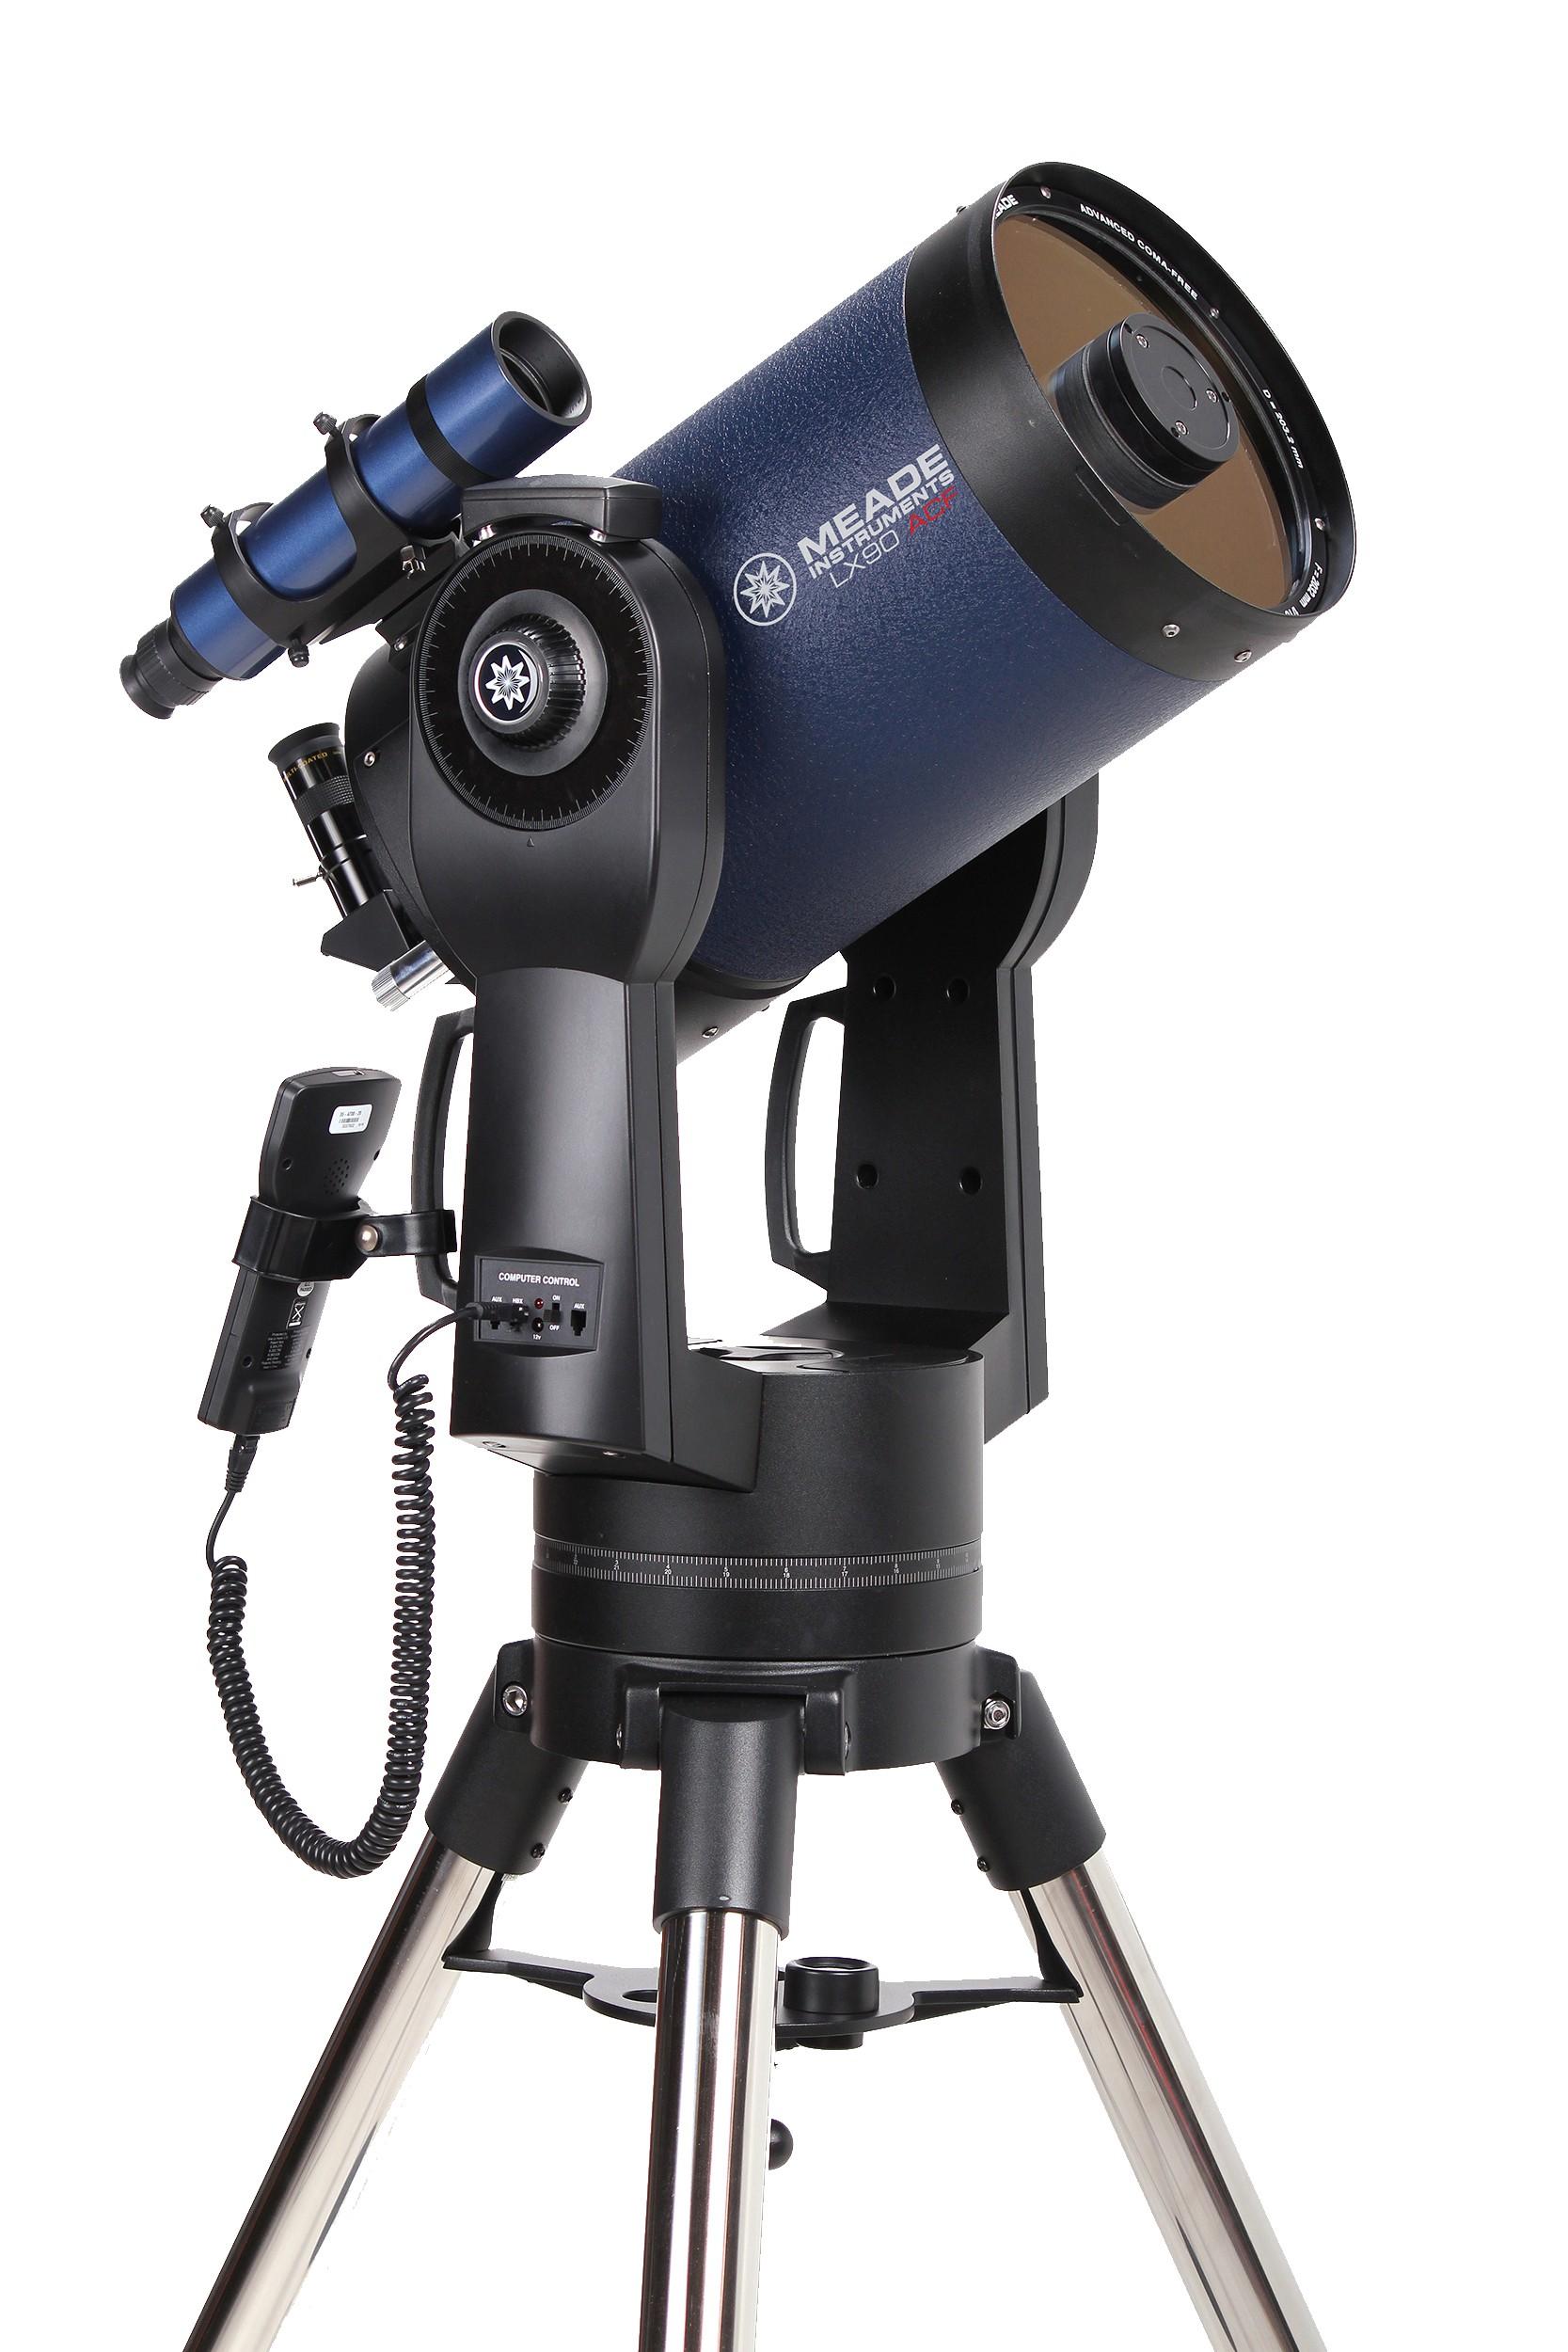 bunny-purchasing-amateur-telescopes-faq-tube-she